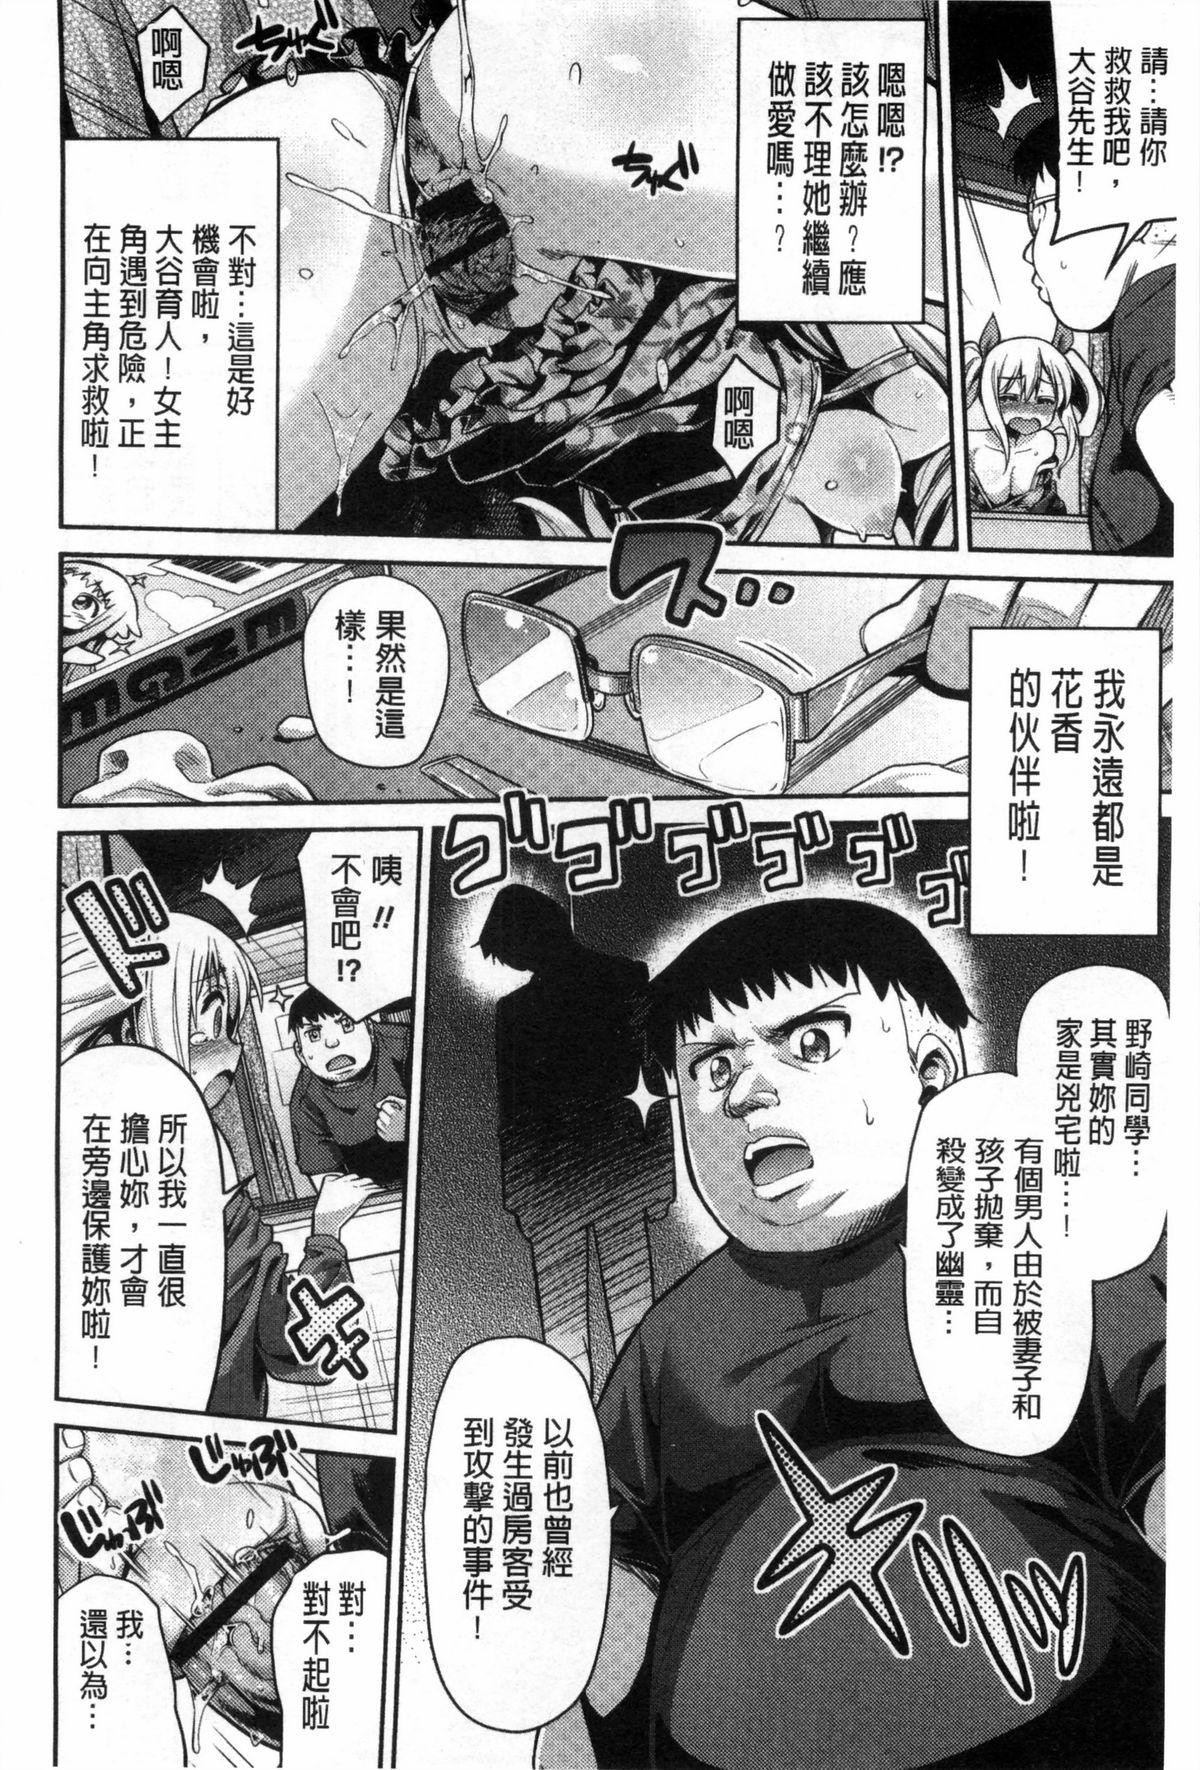 Man x Koi - Ero Manga de Hajimaru Koi no Plot   A漫×戀情 由情色漫畫所萌生的戀之物語 198